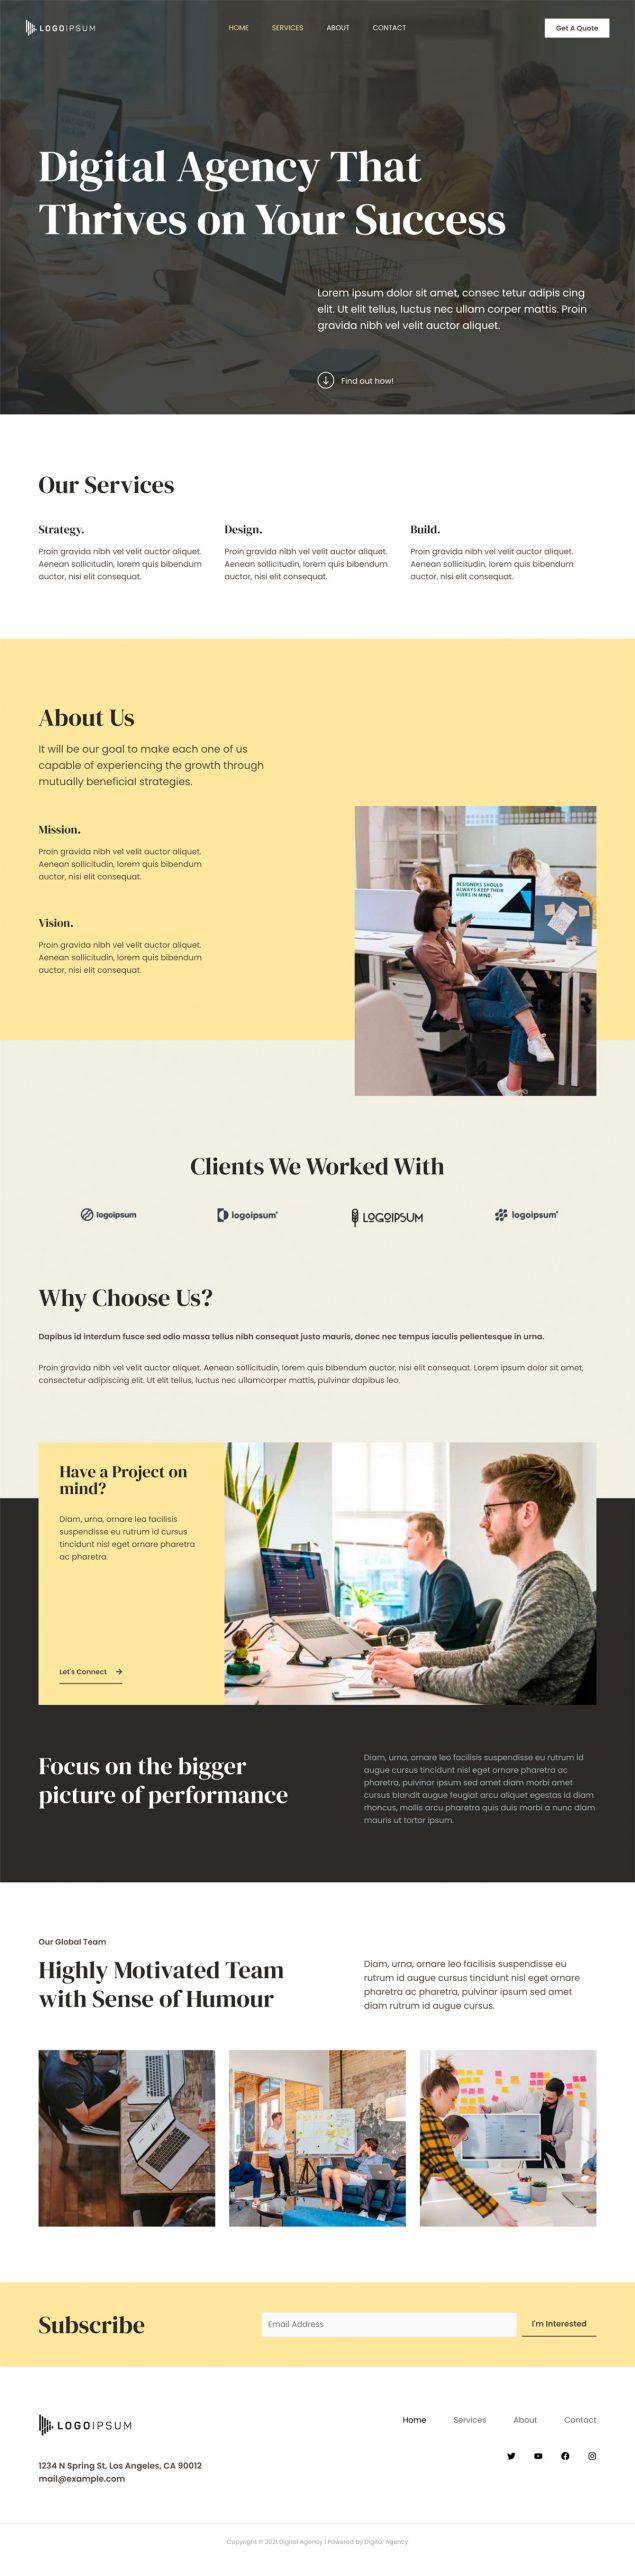 Adamo Web Design | Web Design Durham | digital agency 02 home scaled